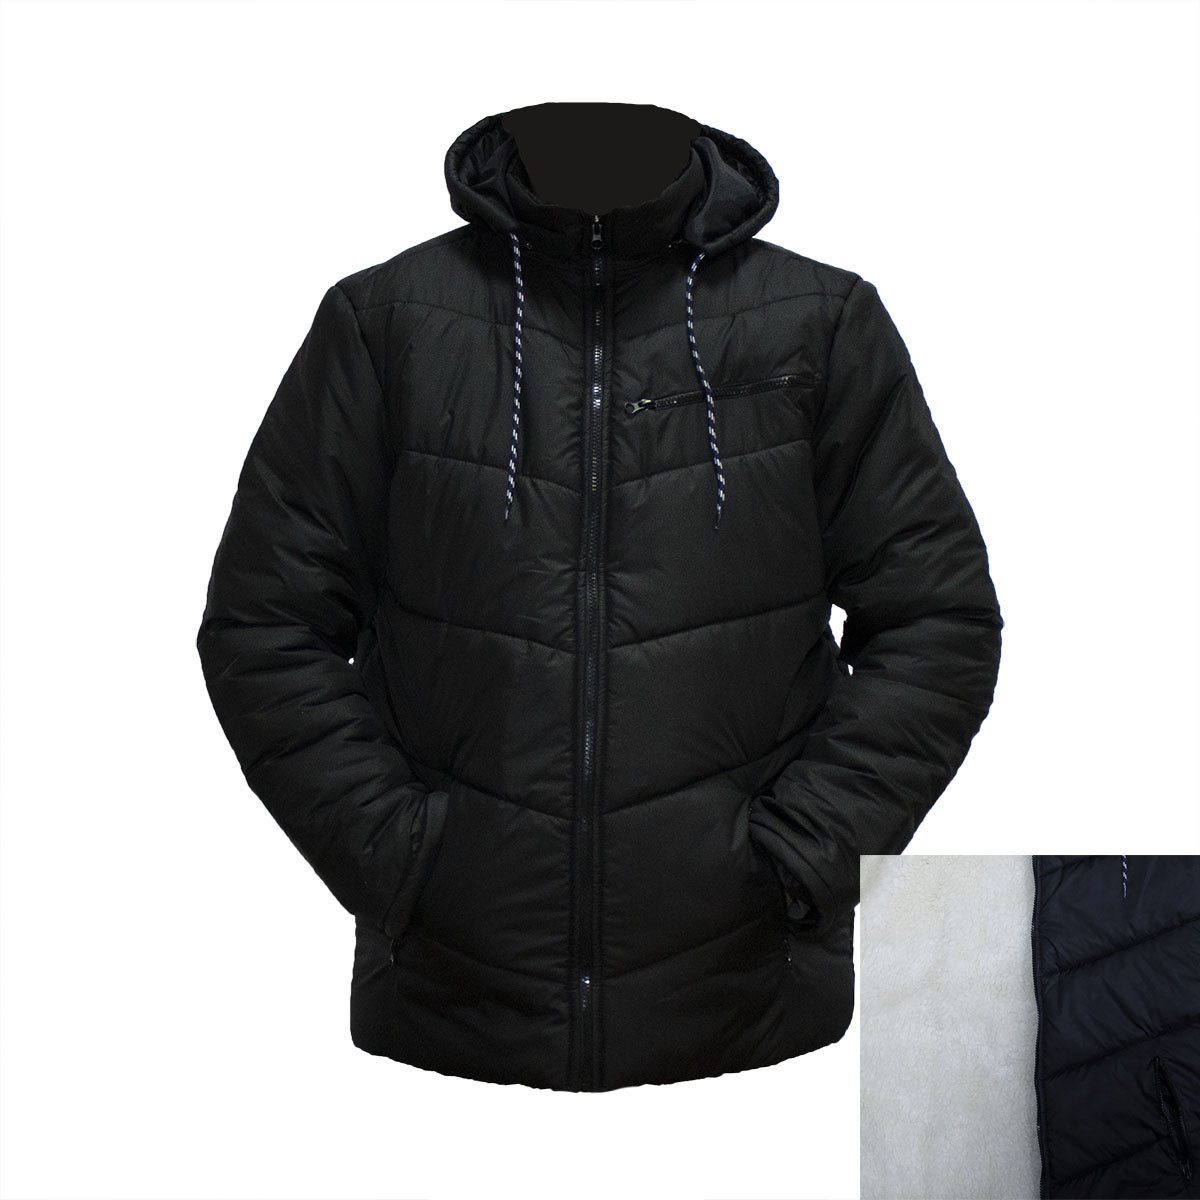 7989255933a1 Зимние мужские куртки на овчине фабричный пошив пр-во Украина E1832H ...